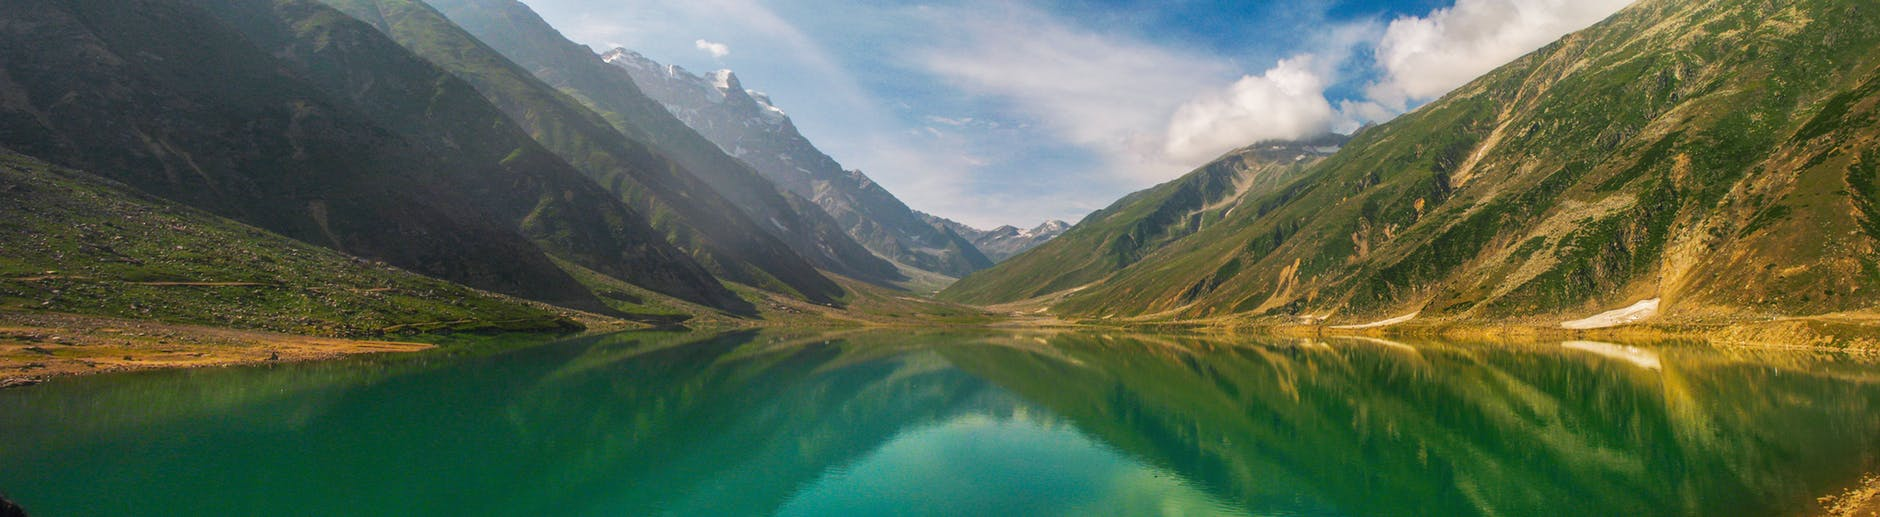 Vacation in Pakistan